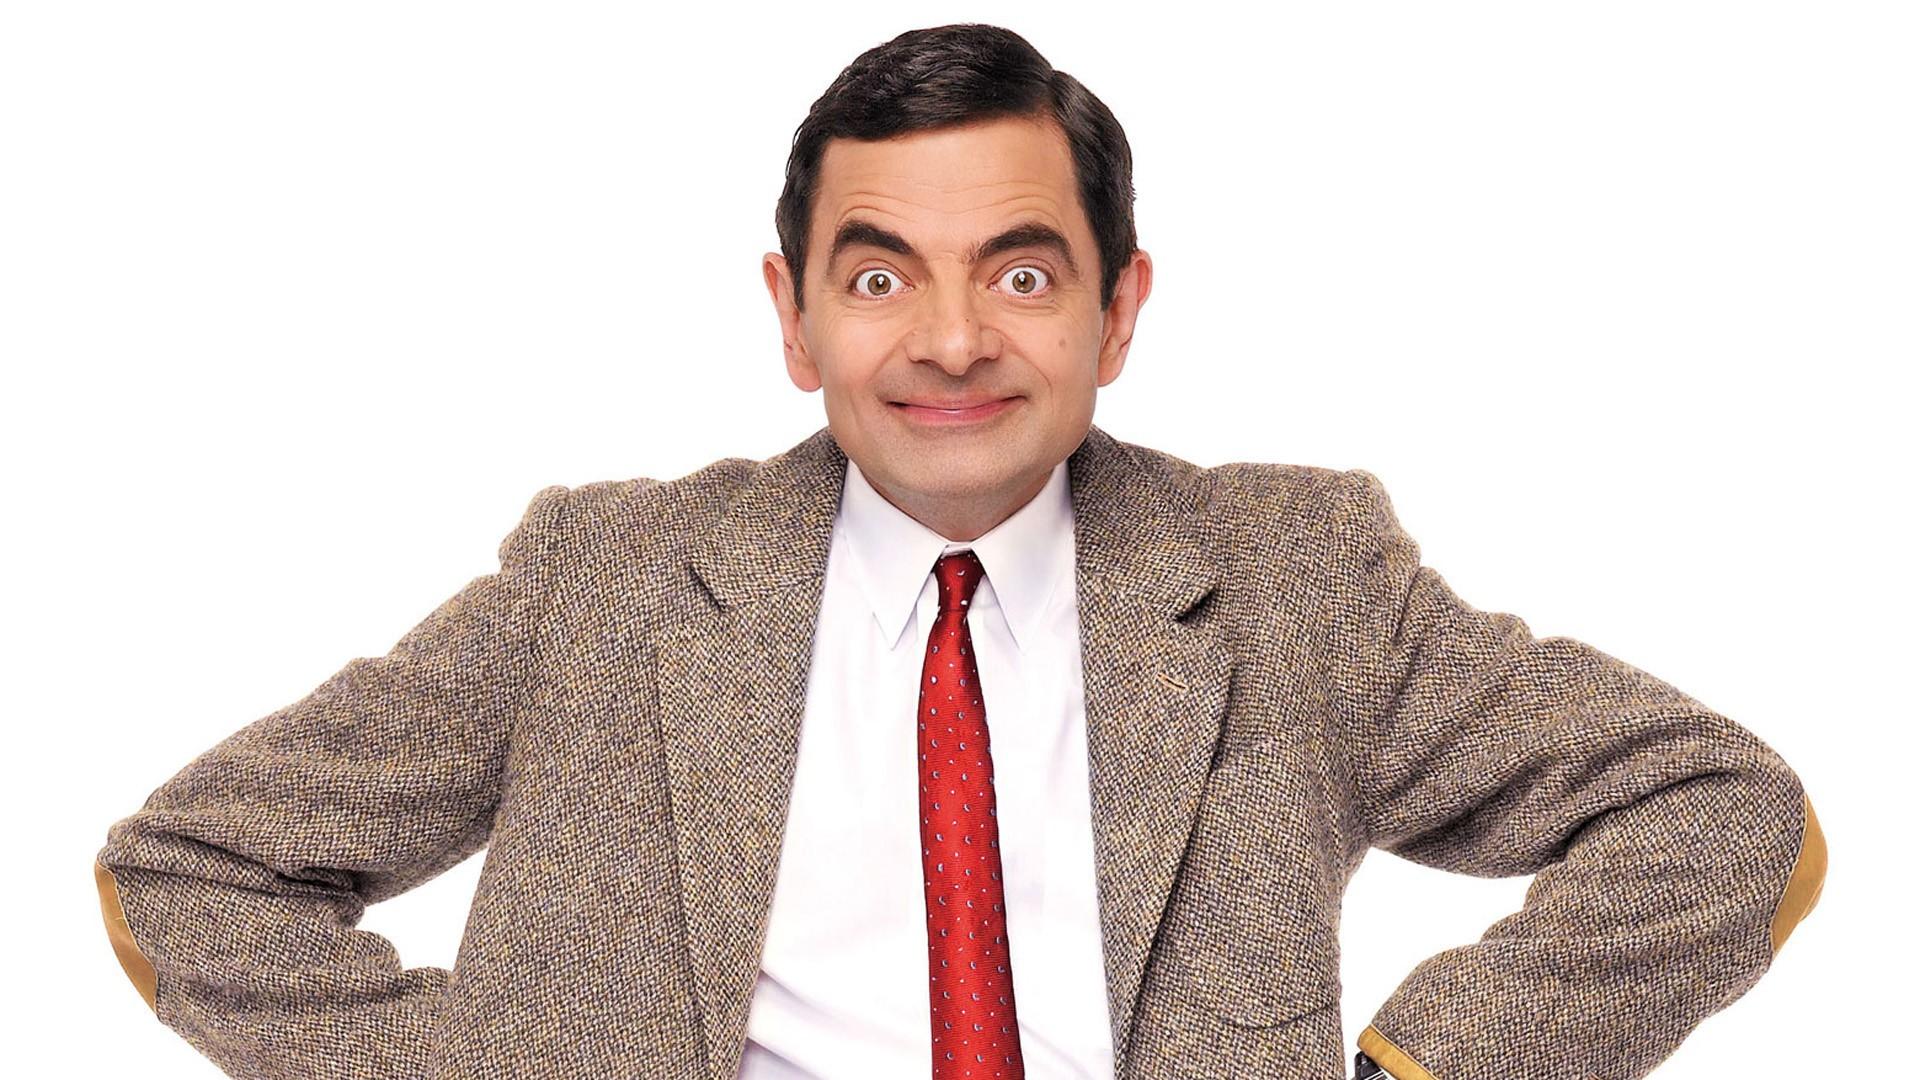 Fondos De Pantalla Películas Persona Rowan Atkinson Sr